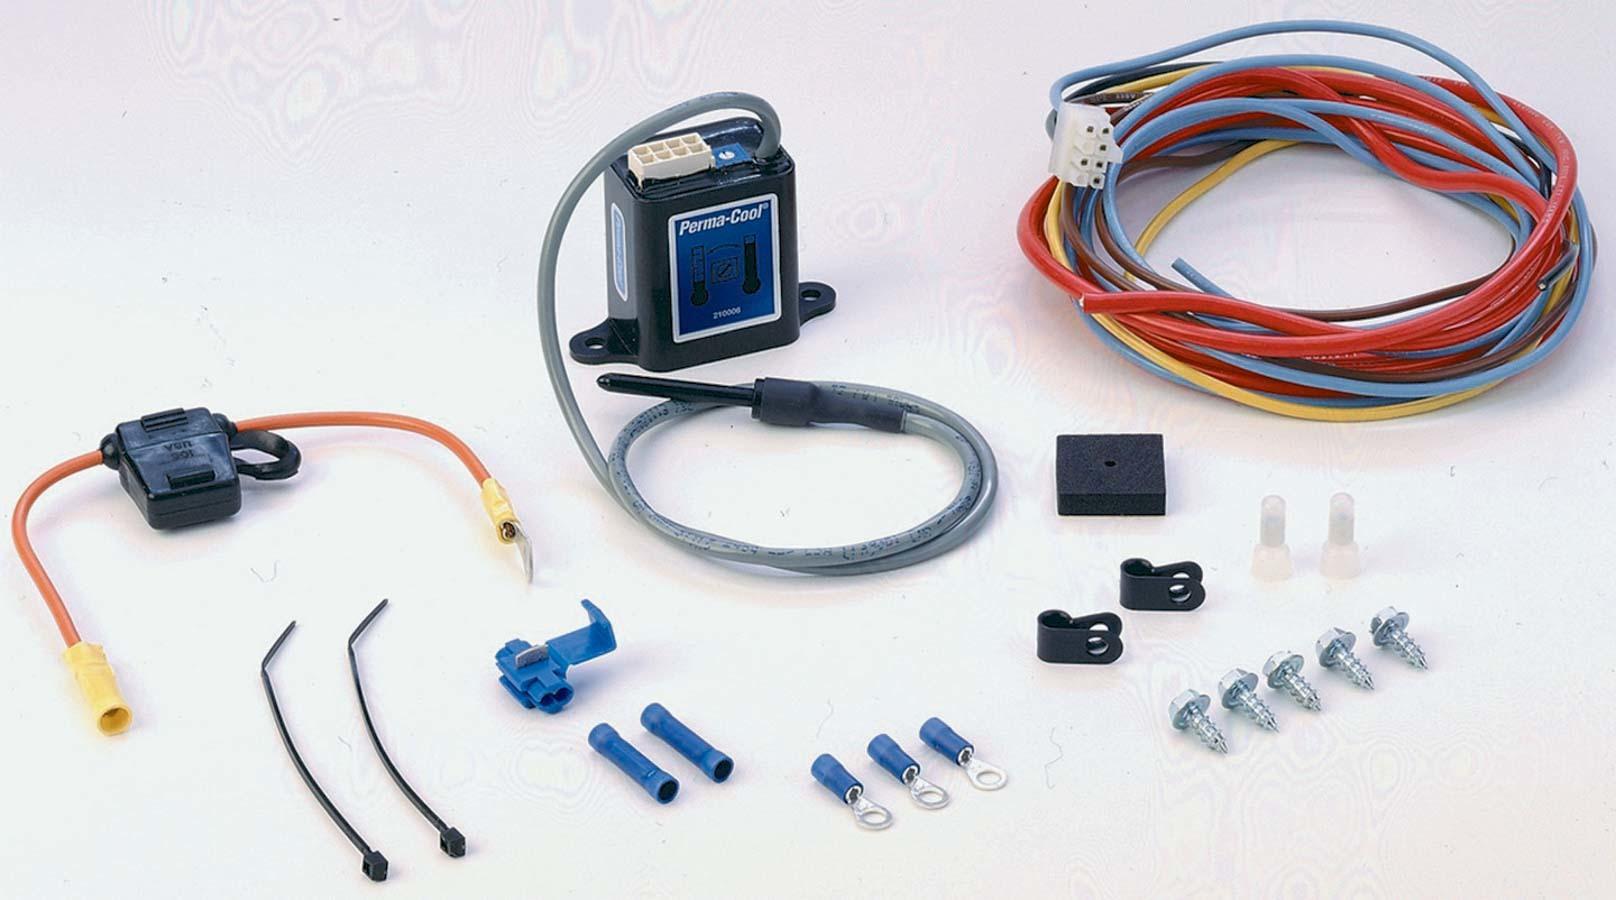 Perma-cool Adjustable Elec. Fan Wiring Kit Probe